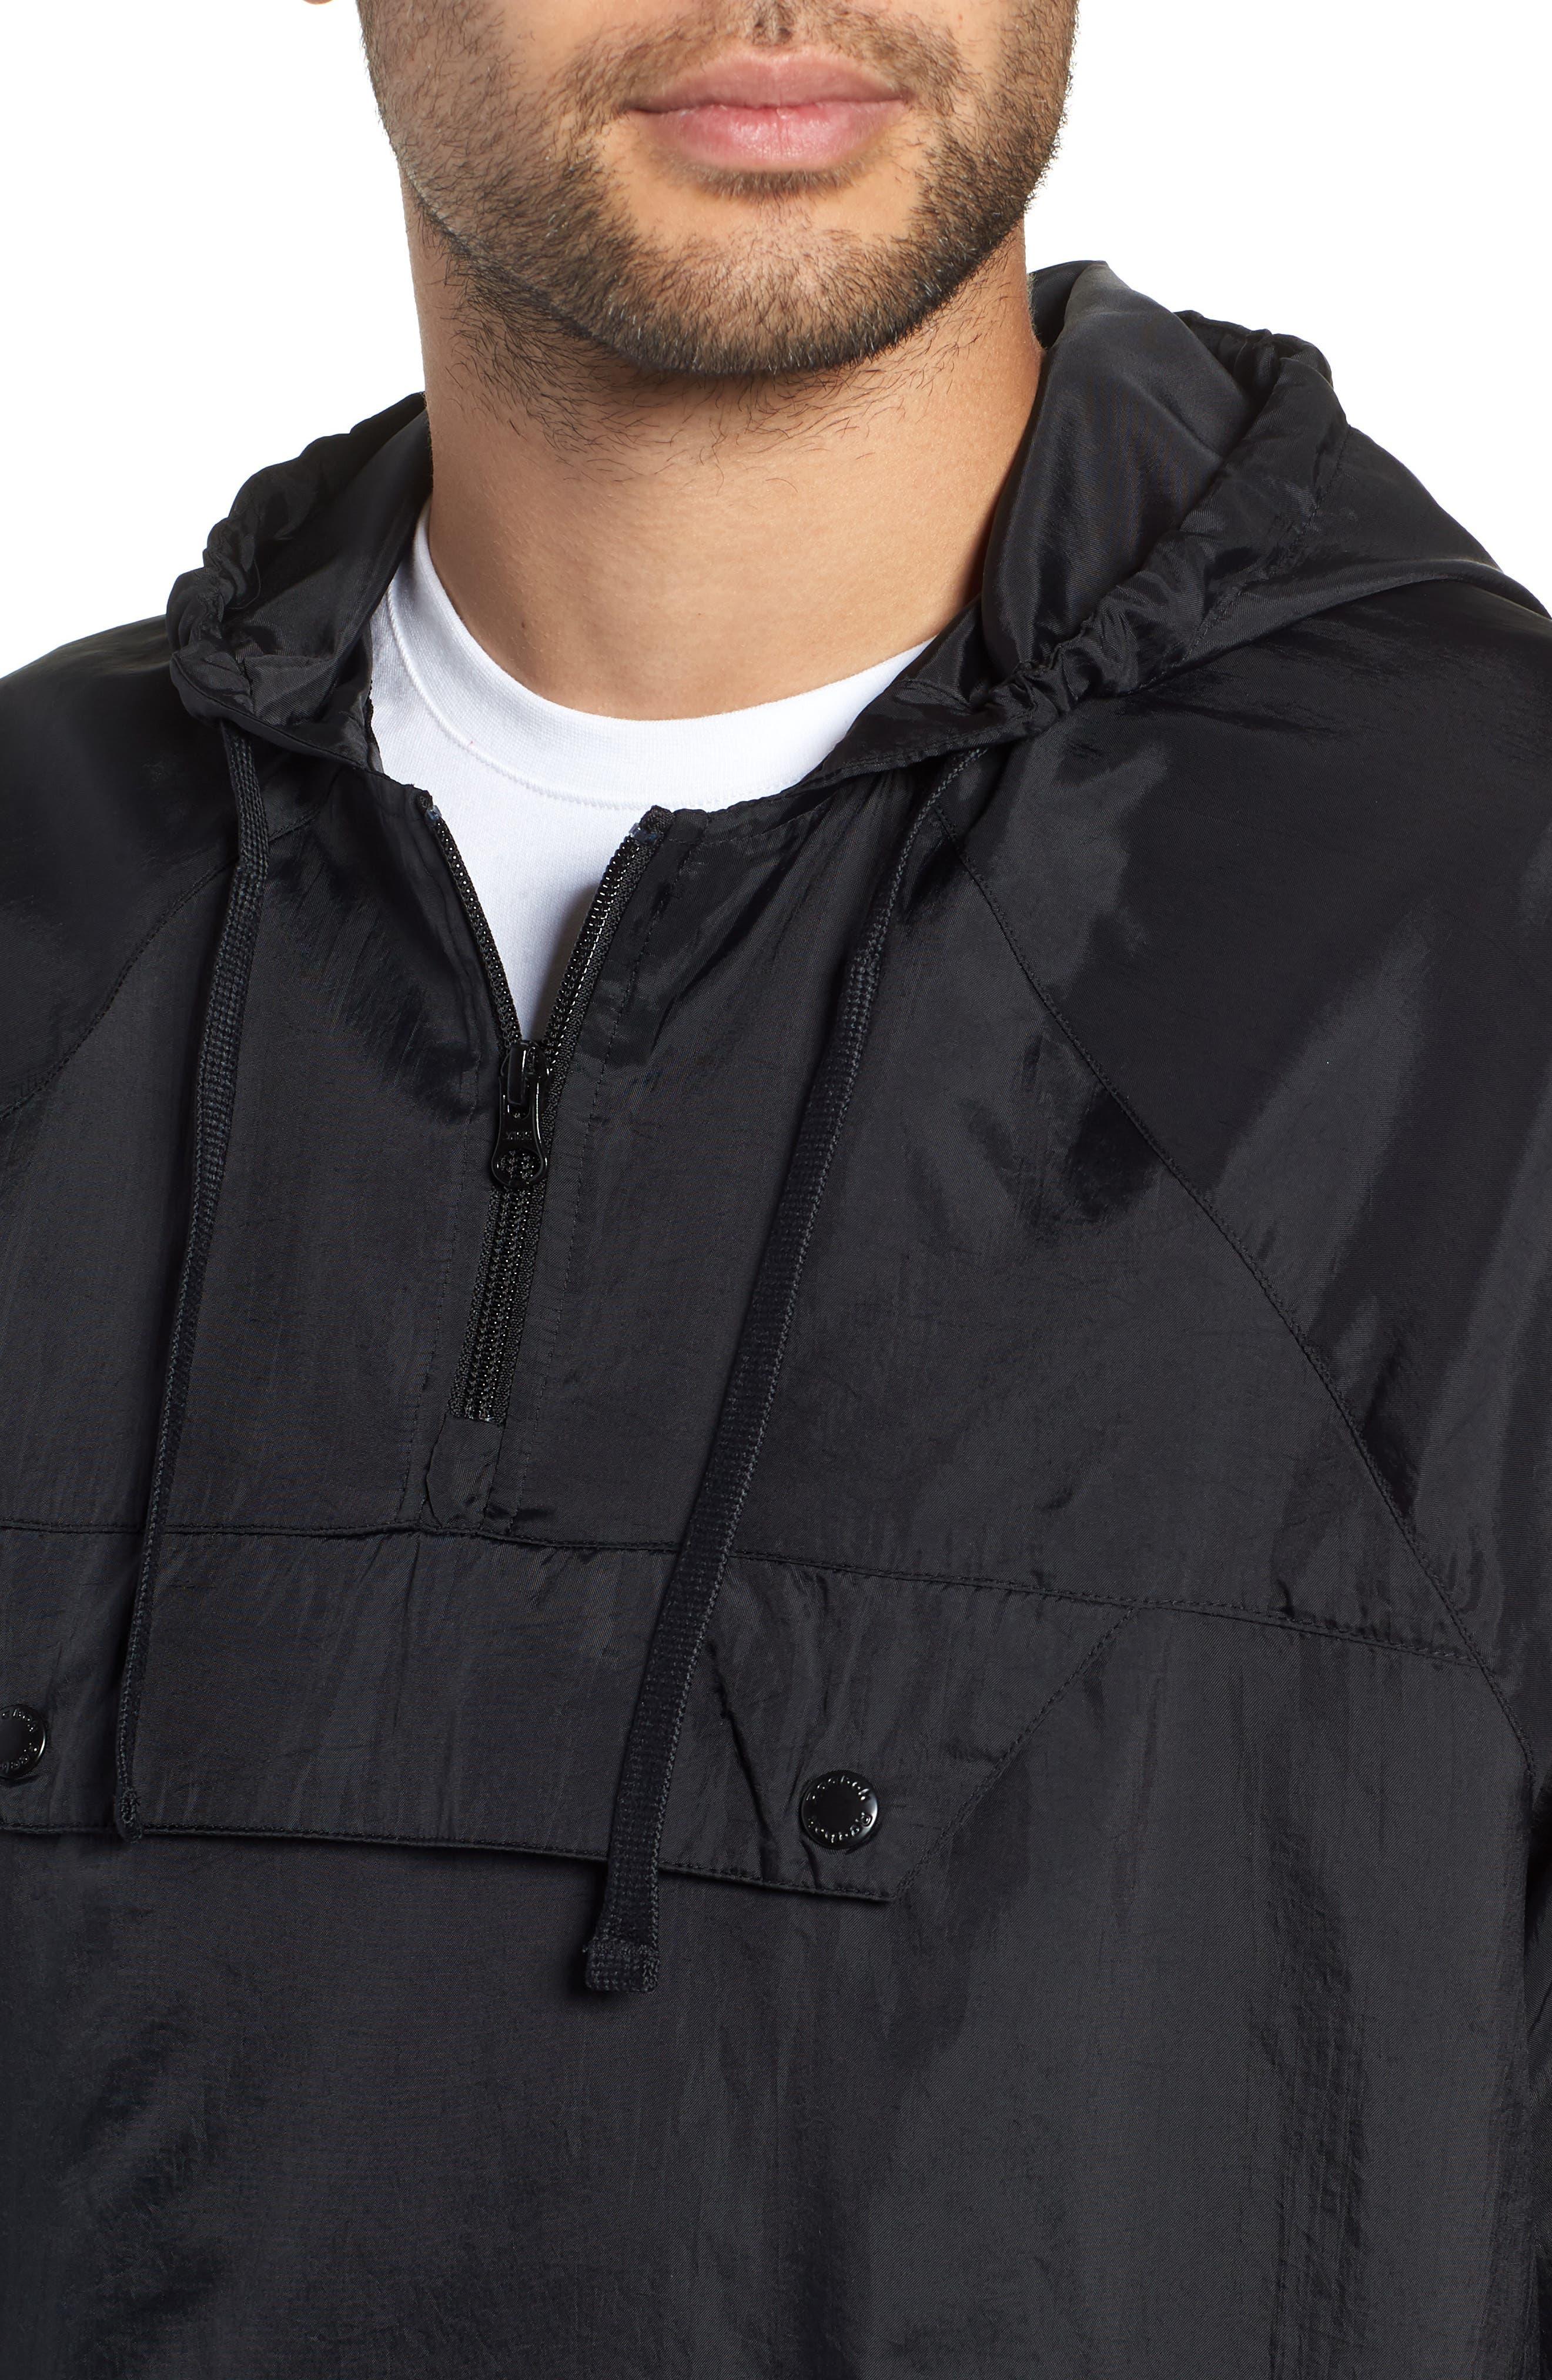 Half Zip Hooded Pullover,                             Alternate thumbnail 4, color,                             BLACK